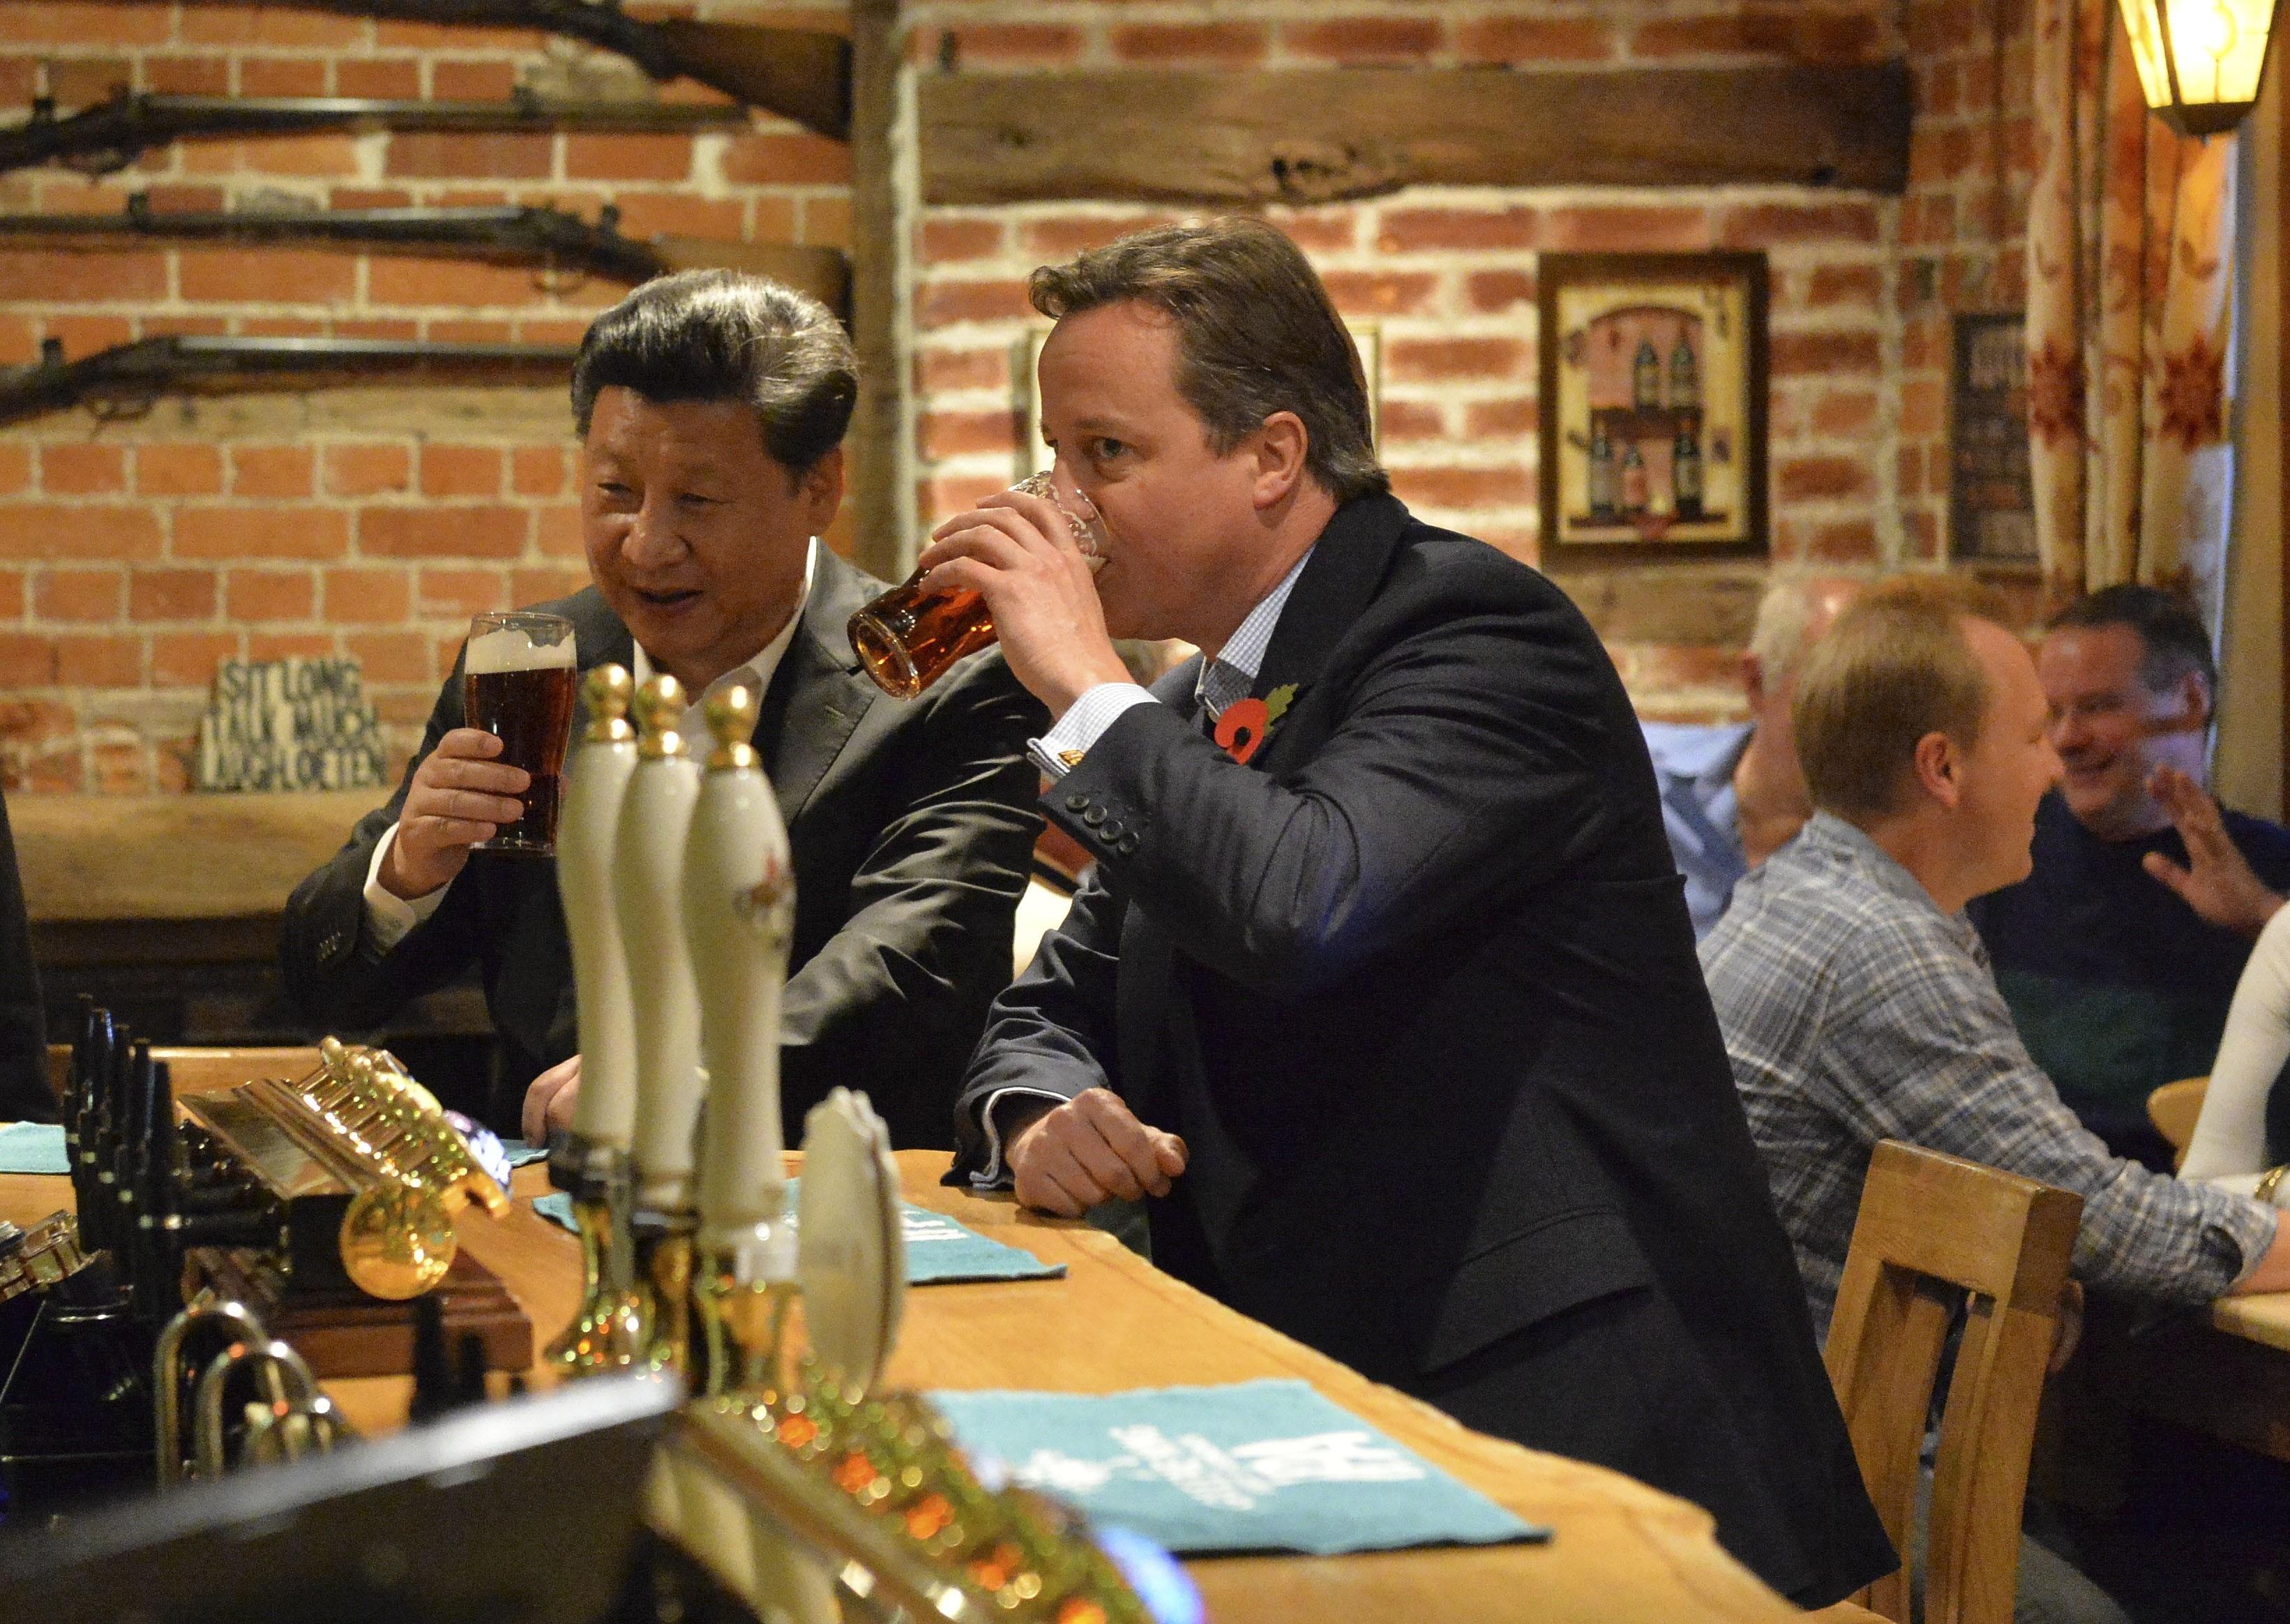 Chinese President Xi Jinping visits UK